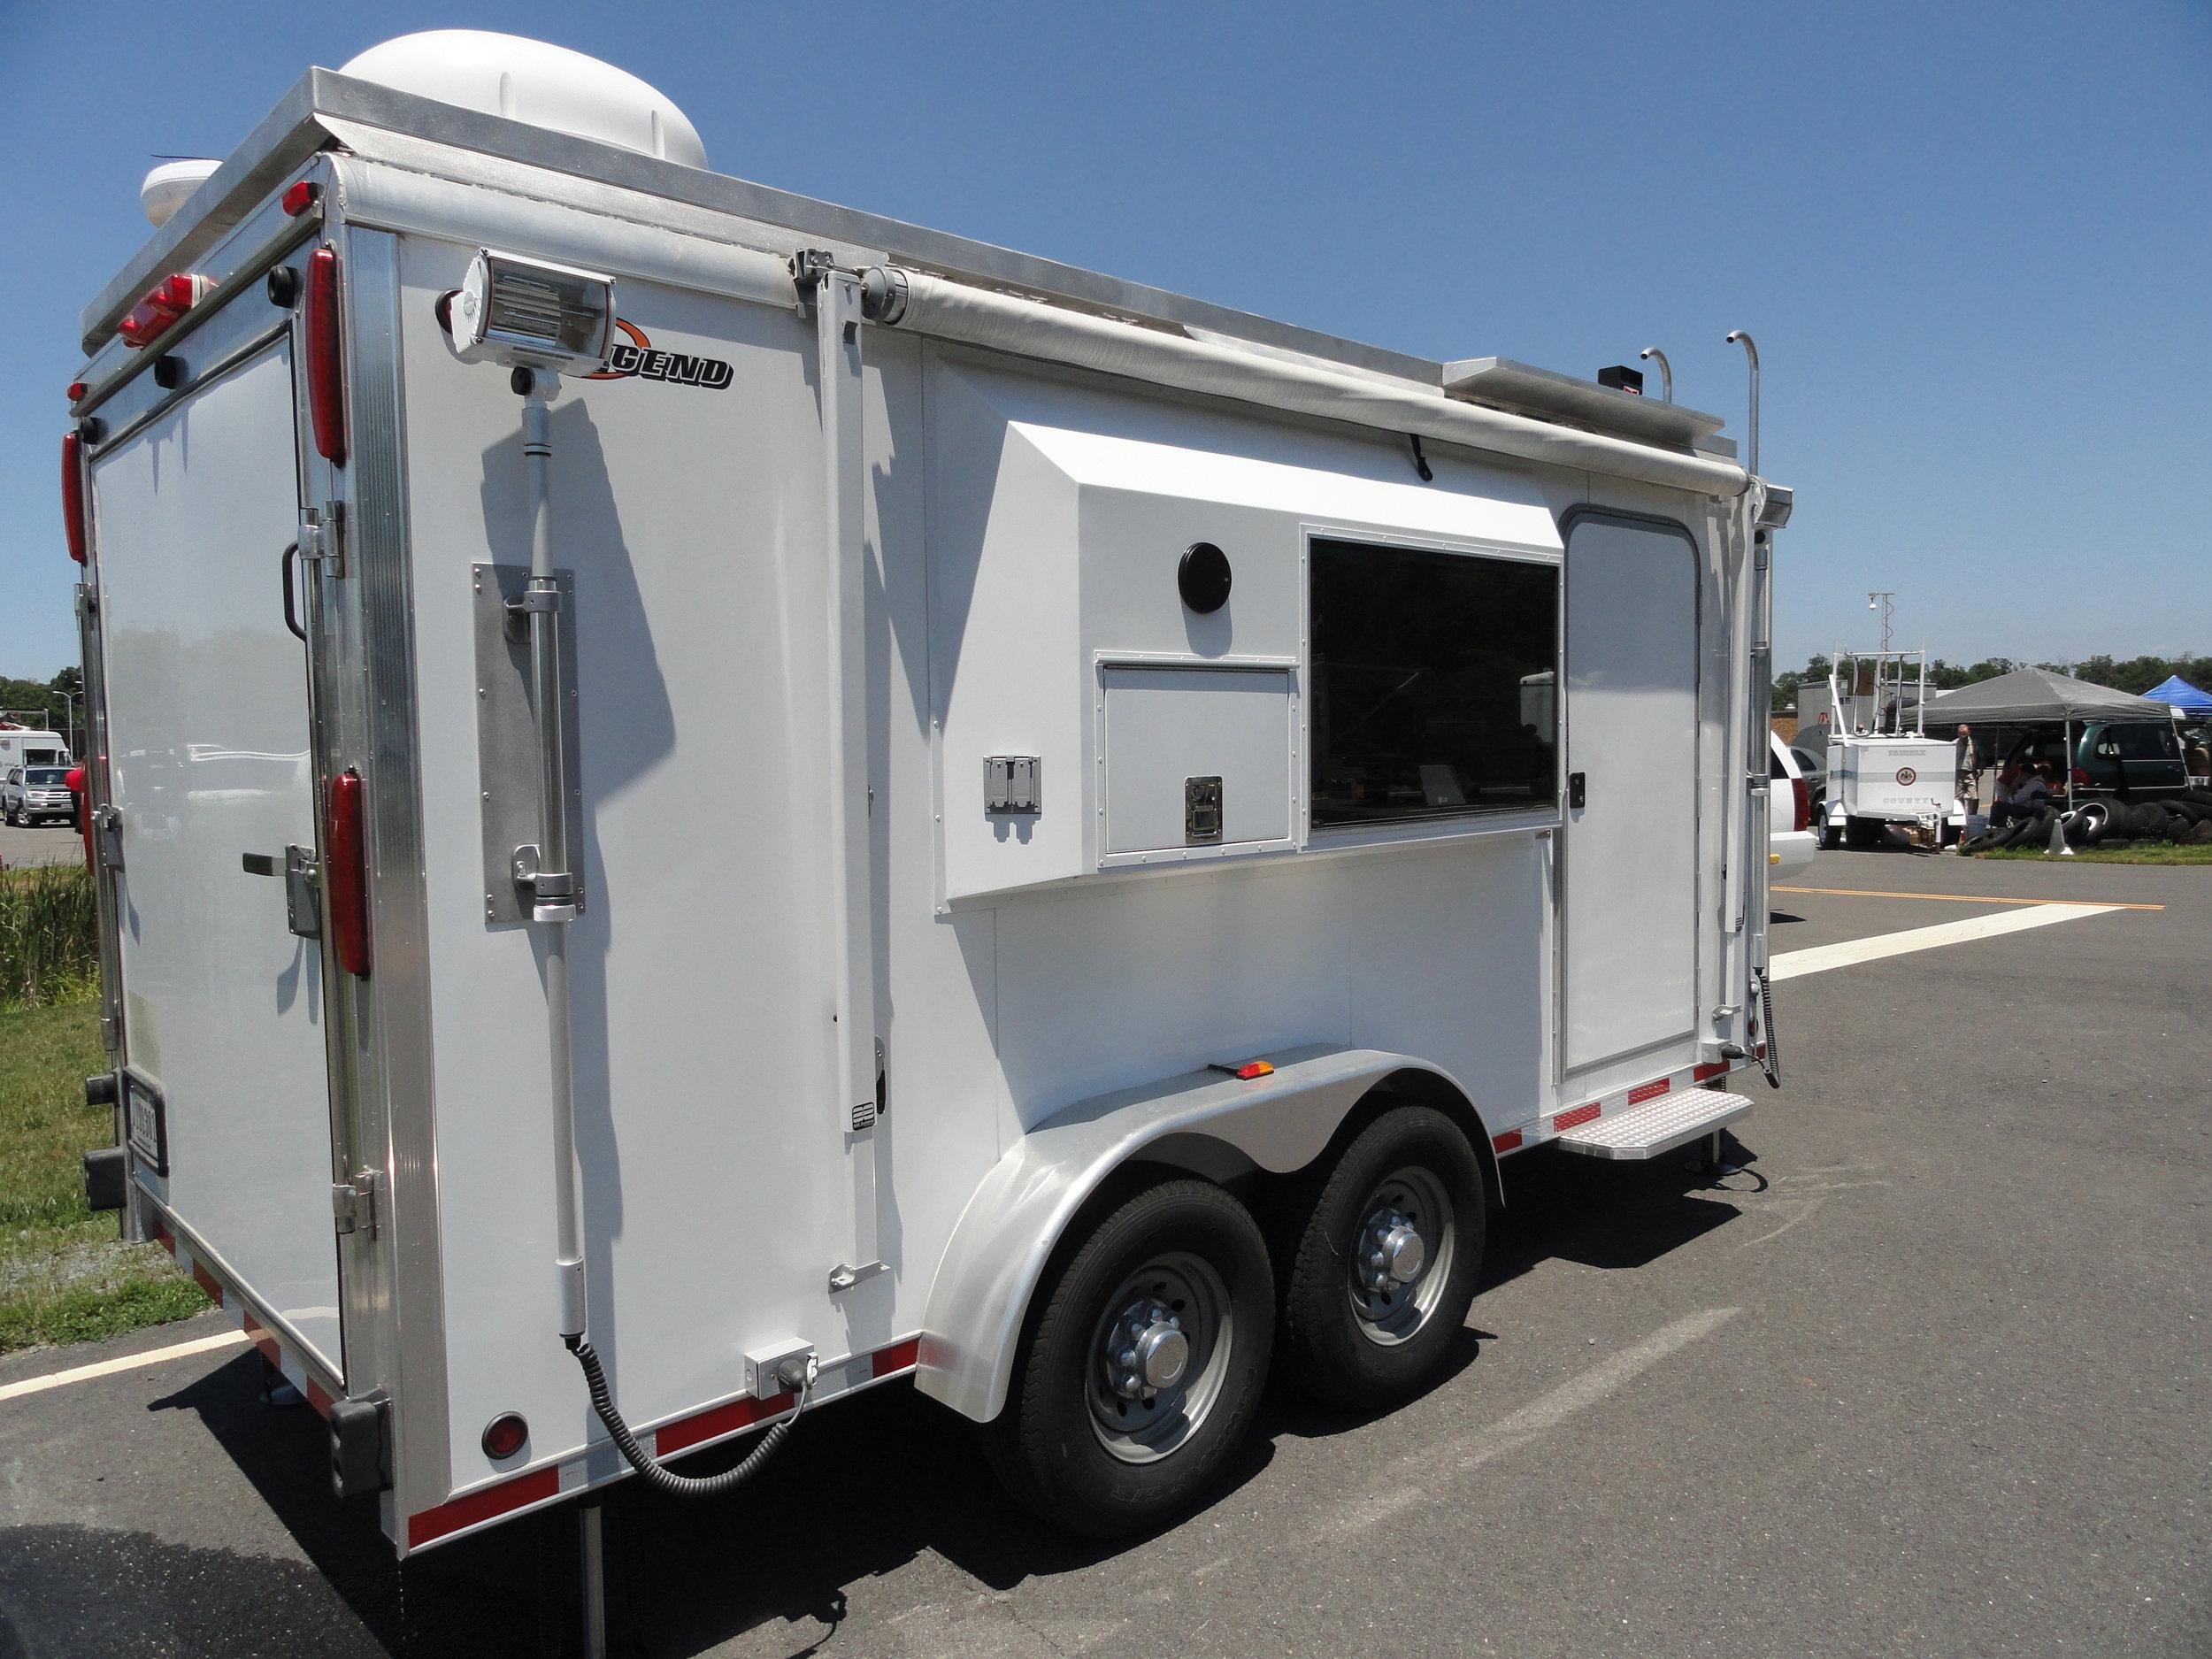 29 CVS - FBI HNT trailer at 2011 Rally pic #1.JPG